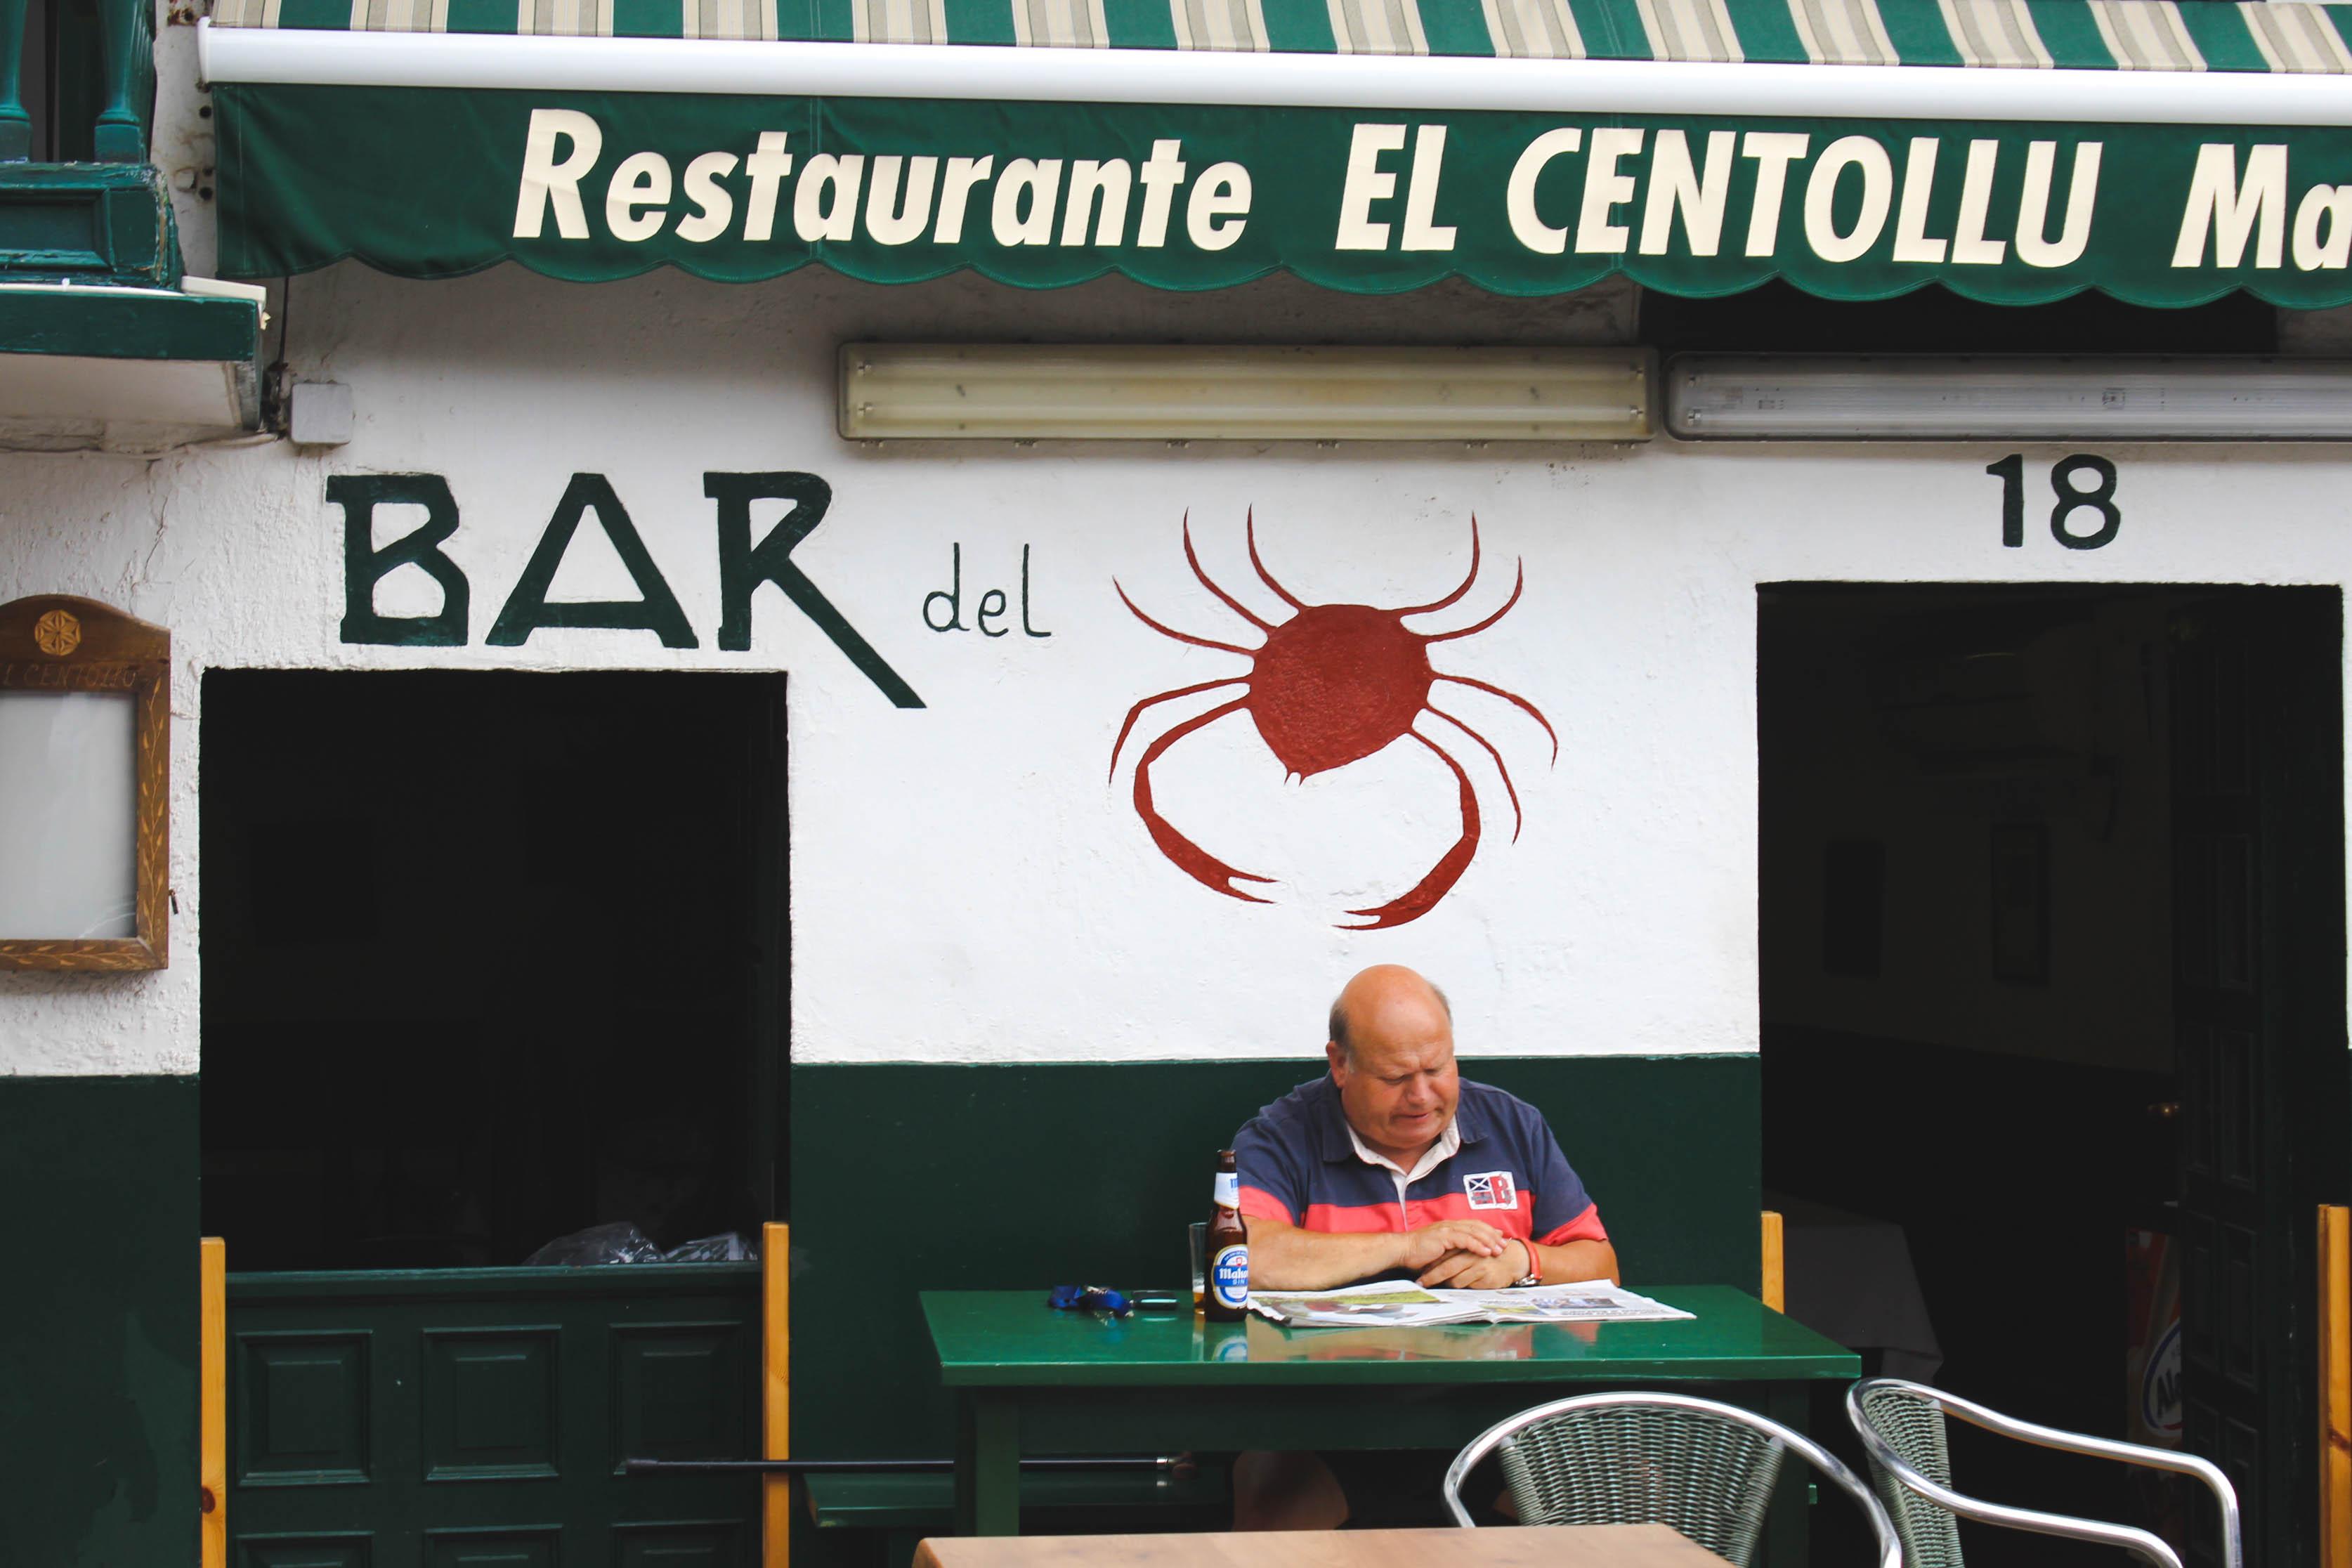 Asturias - Irene Mendez